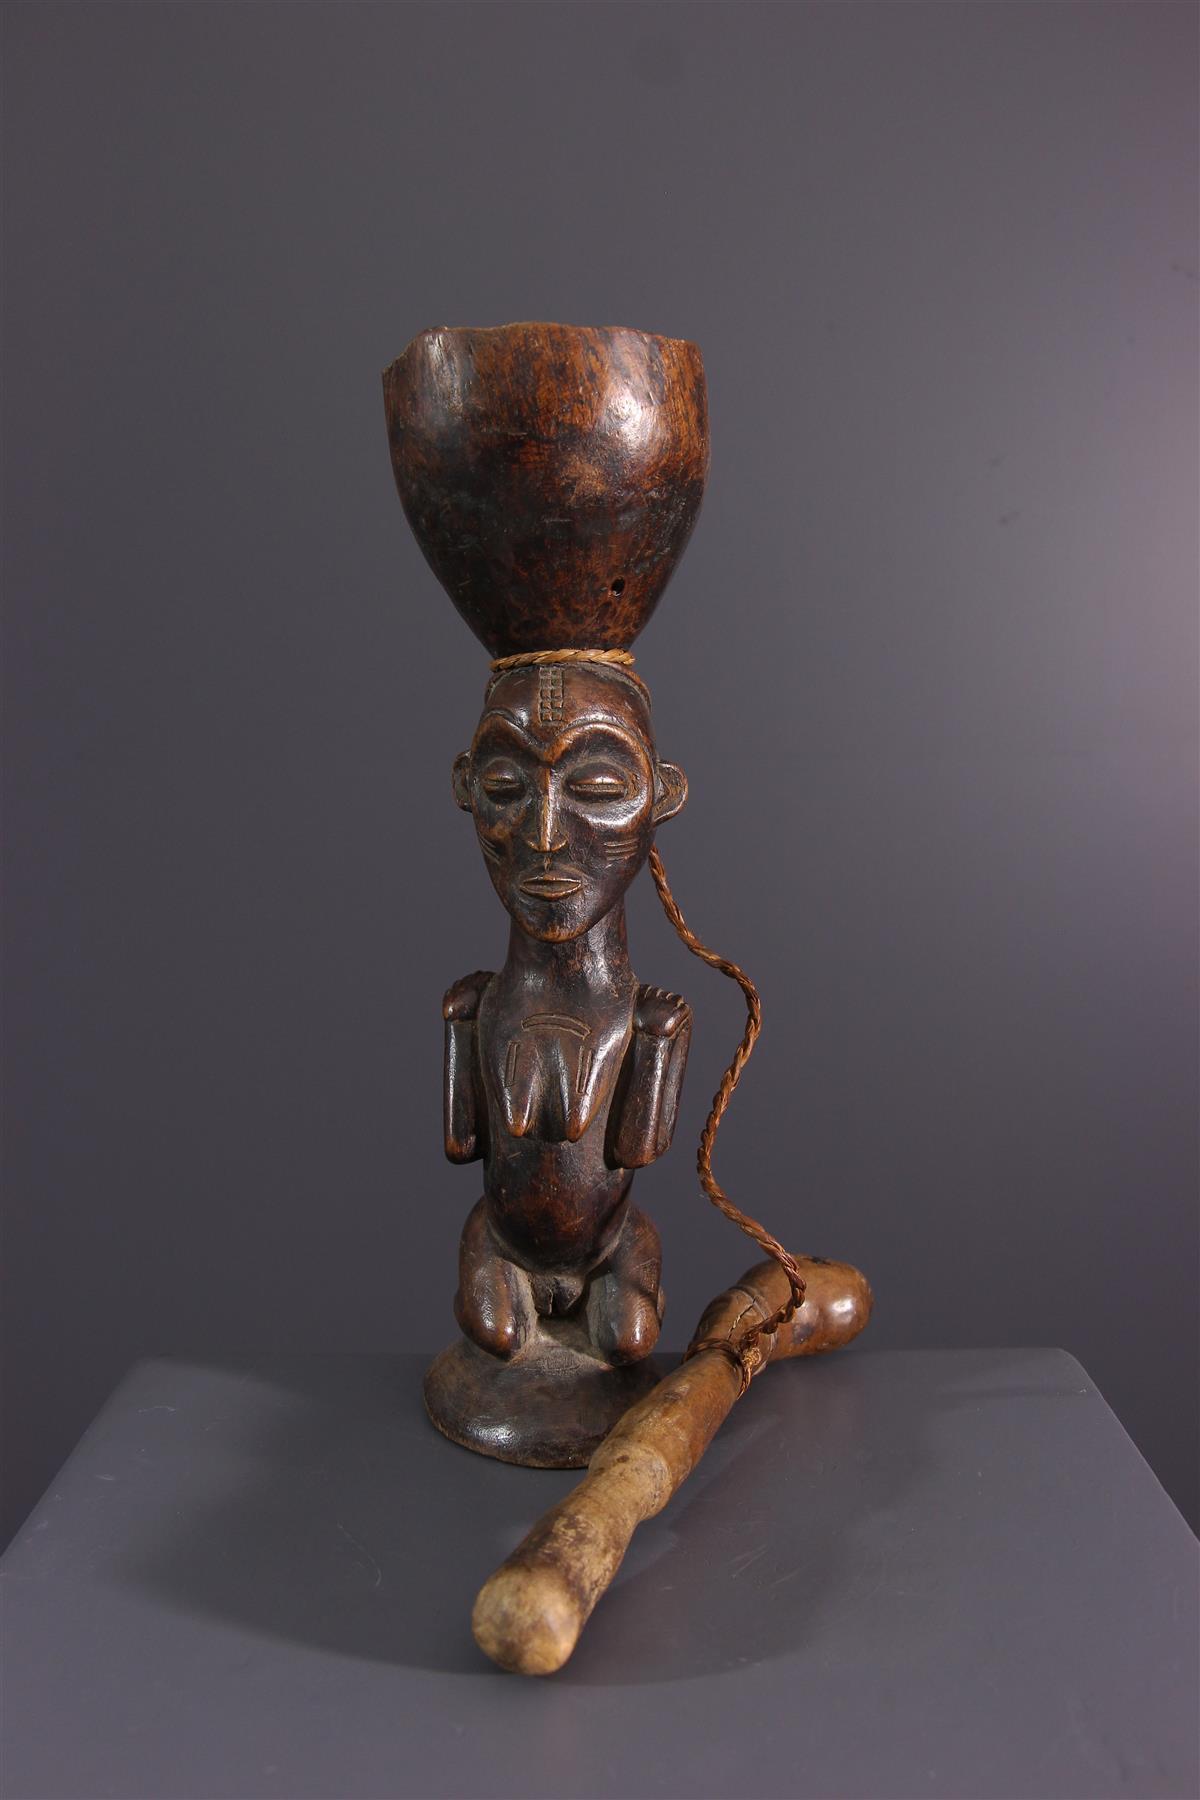 Tabatière Tschokwe - African art